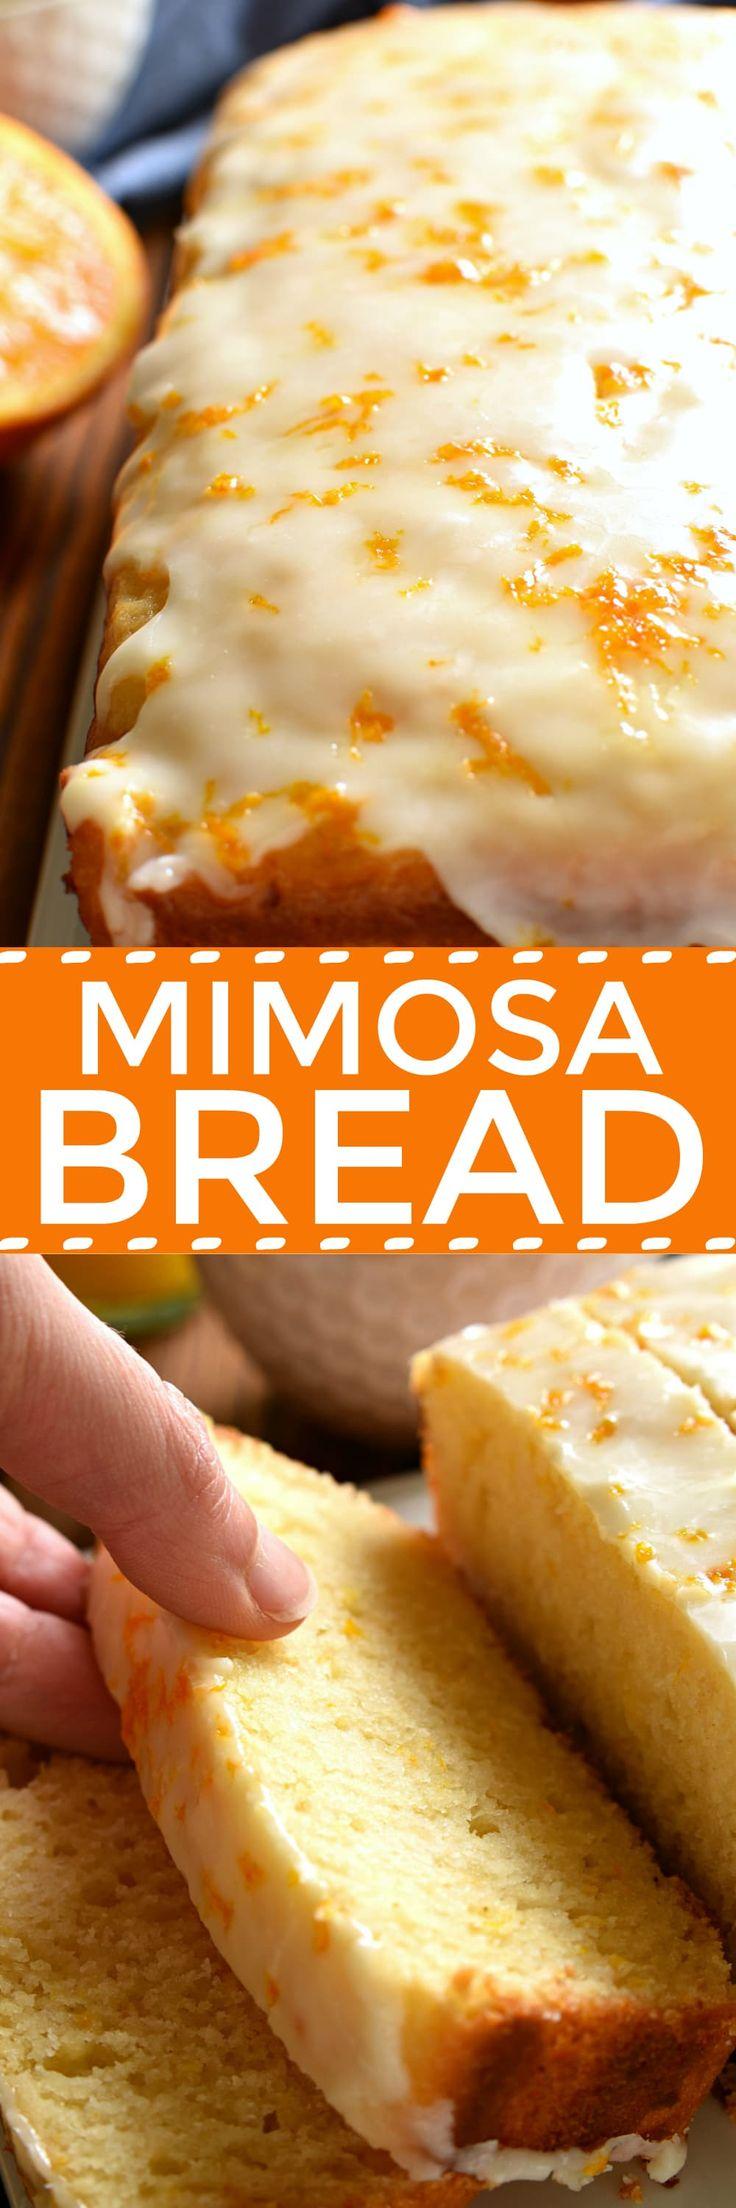 Glazed Mimosa Bread